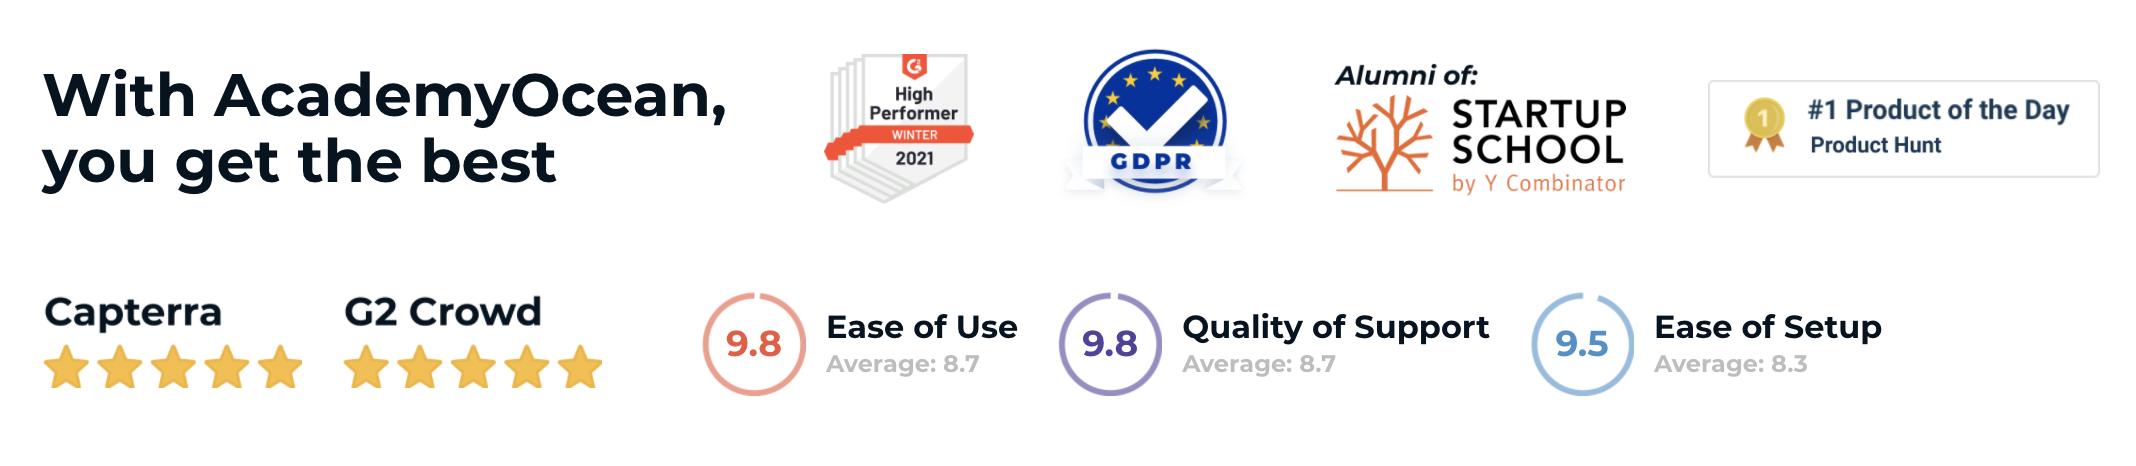 AcademyOcean rating